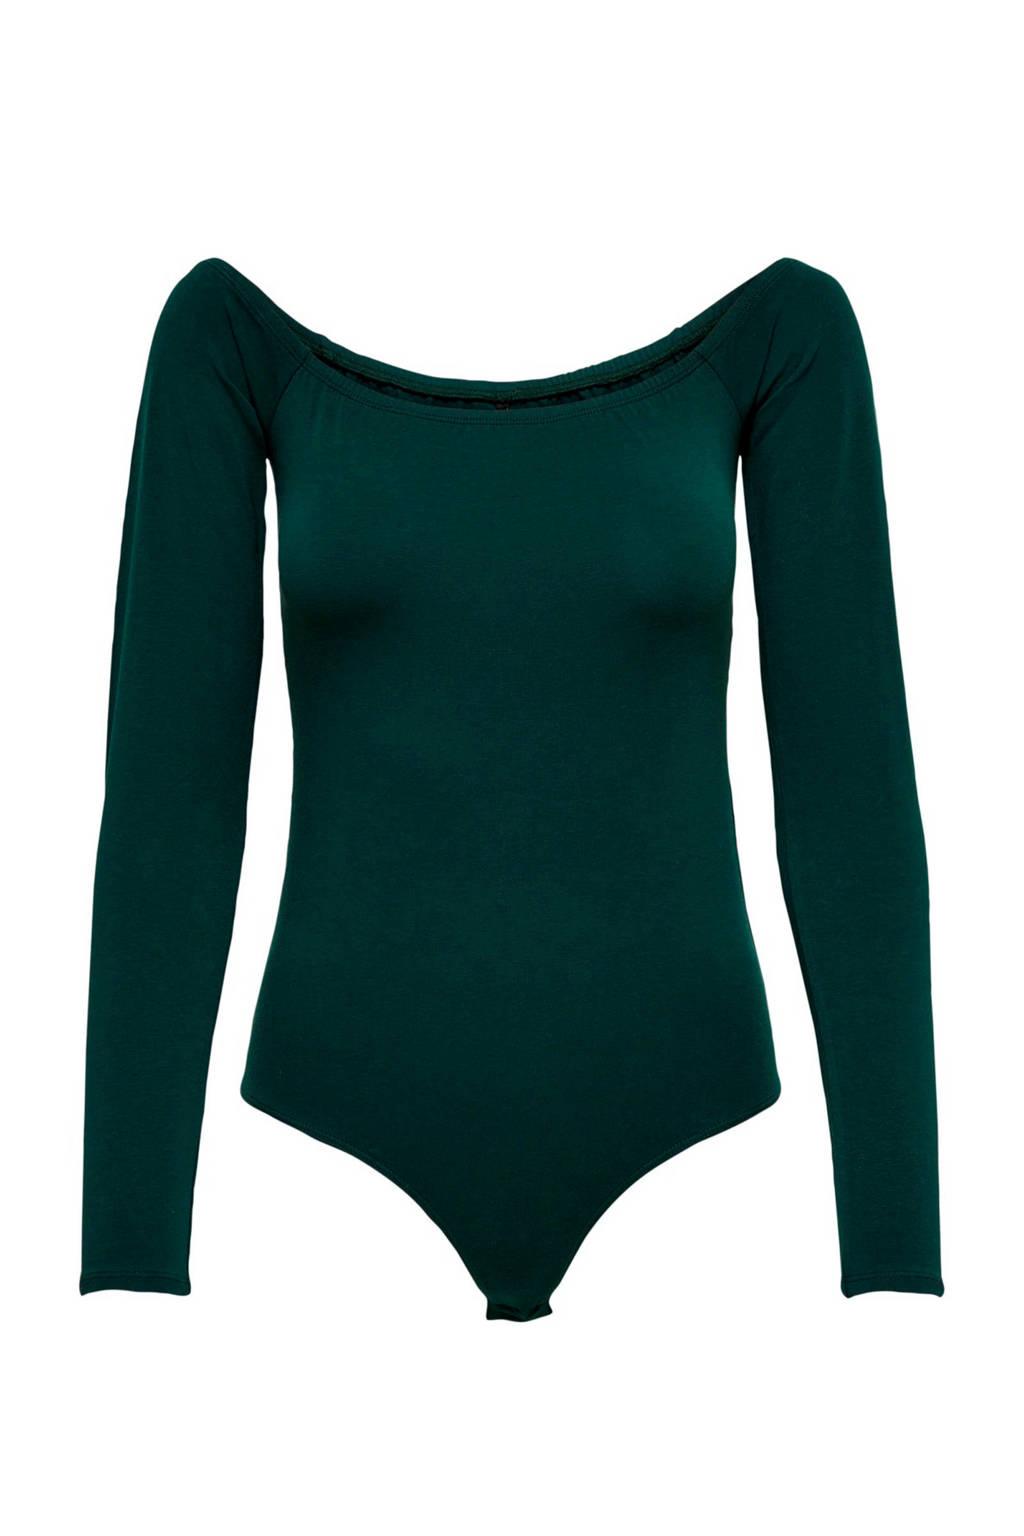 ONLY body groen, Groen